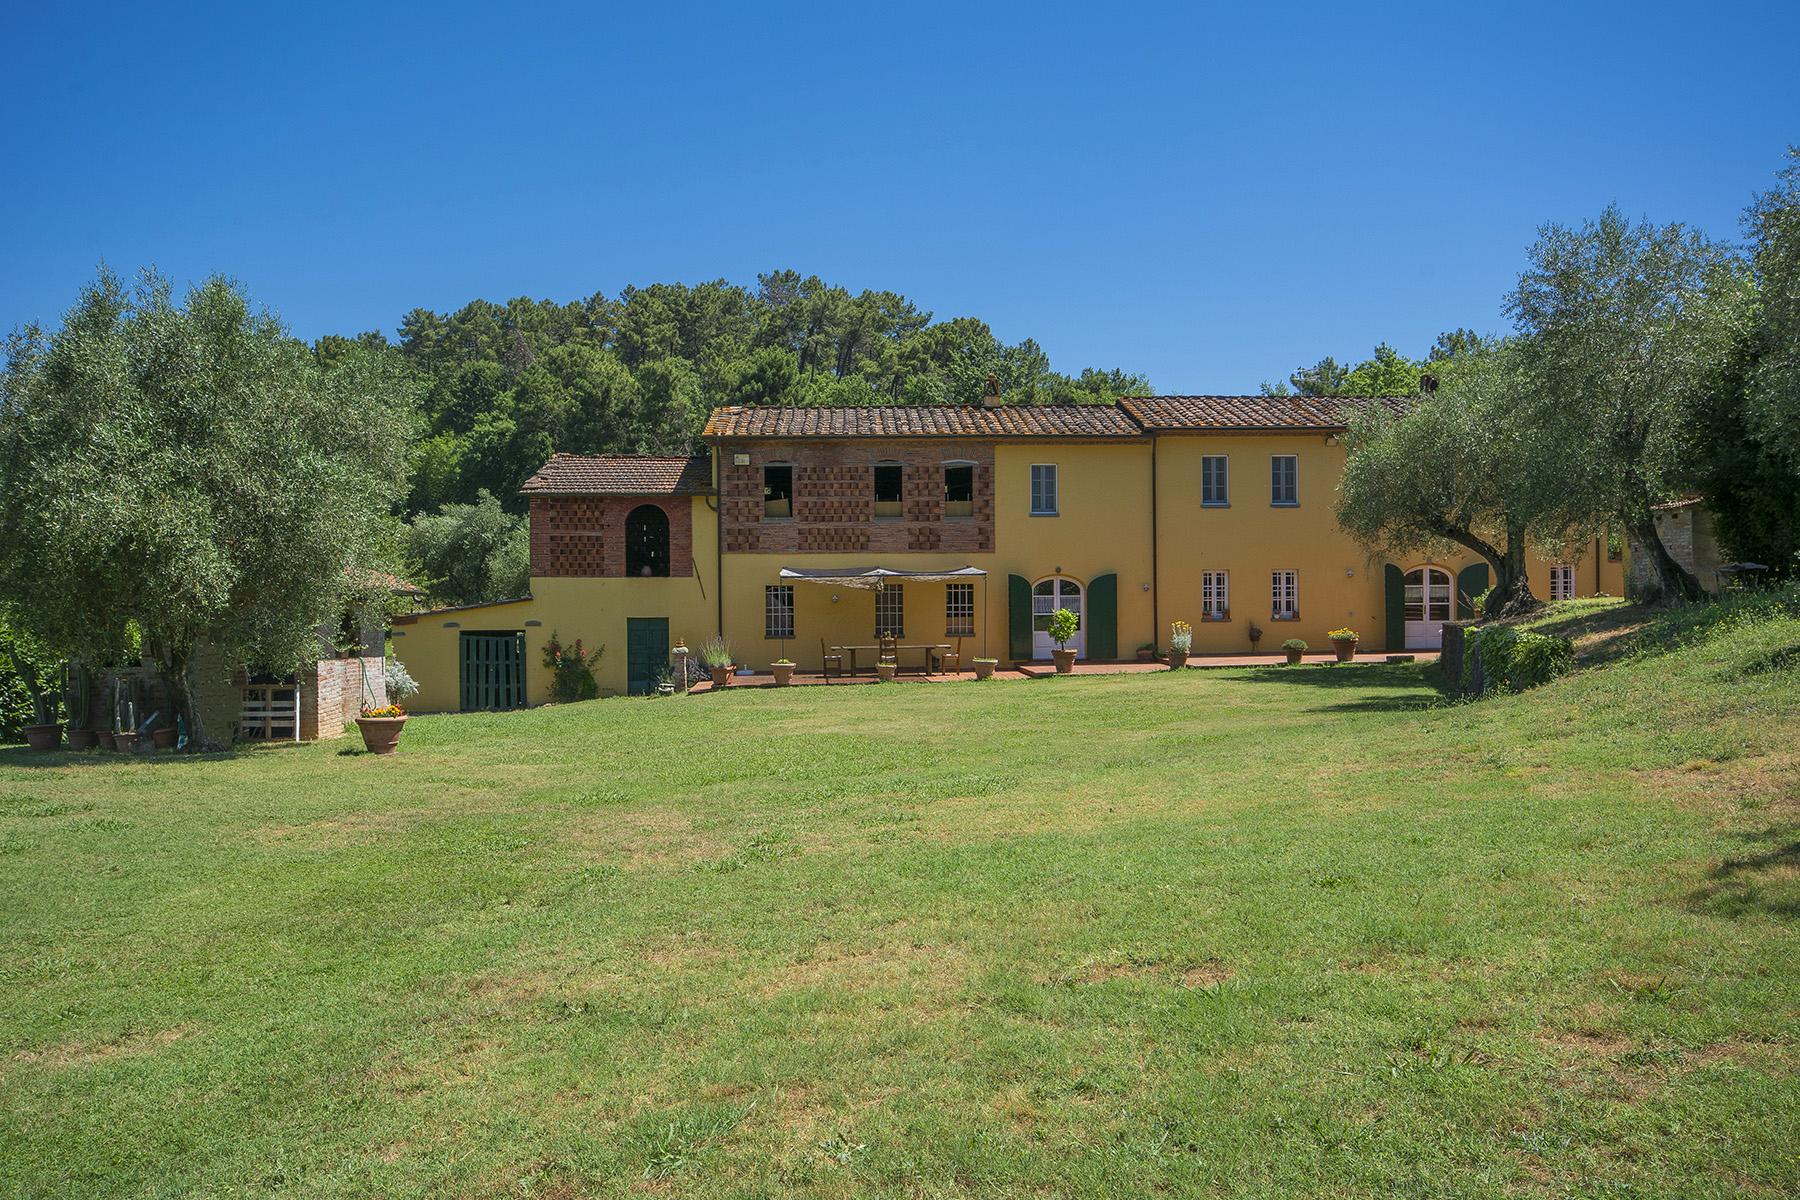 Rustico in Vendita a Capannori: 5 locali, 400 mq